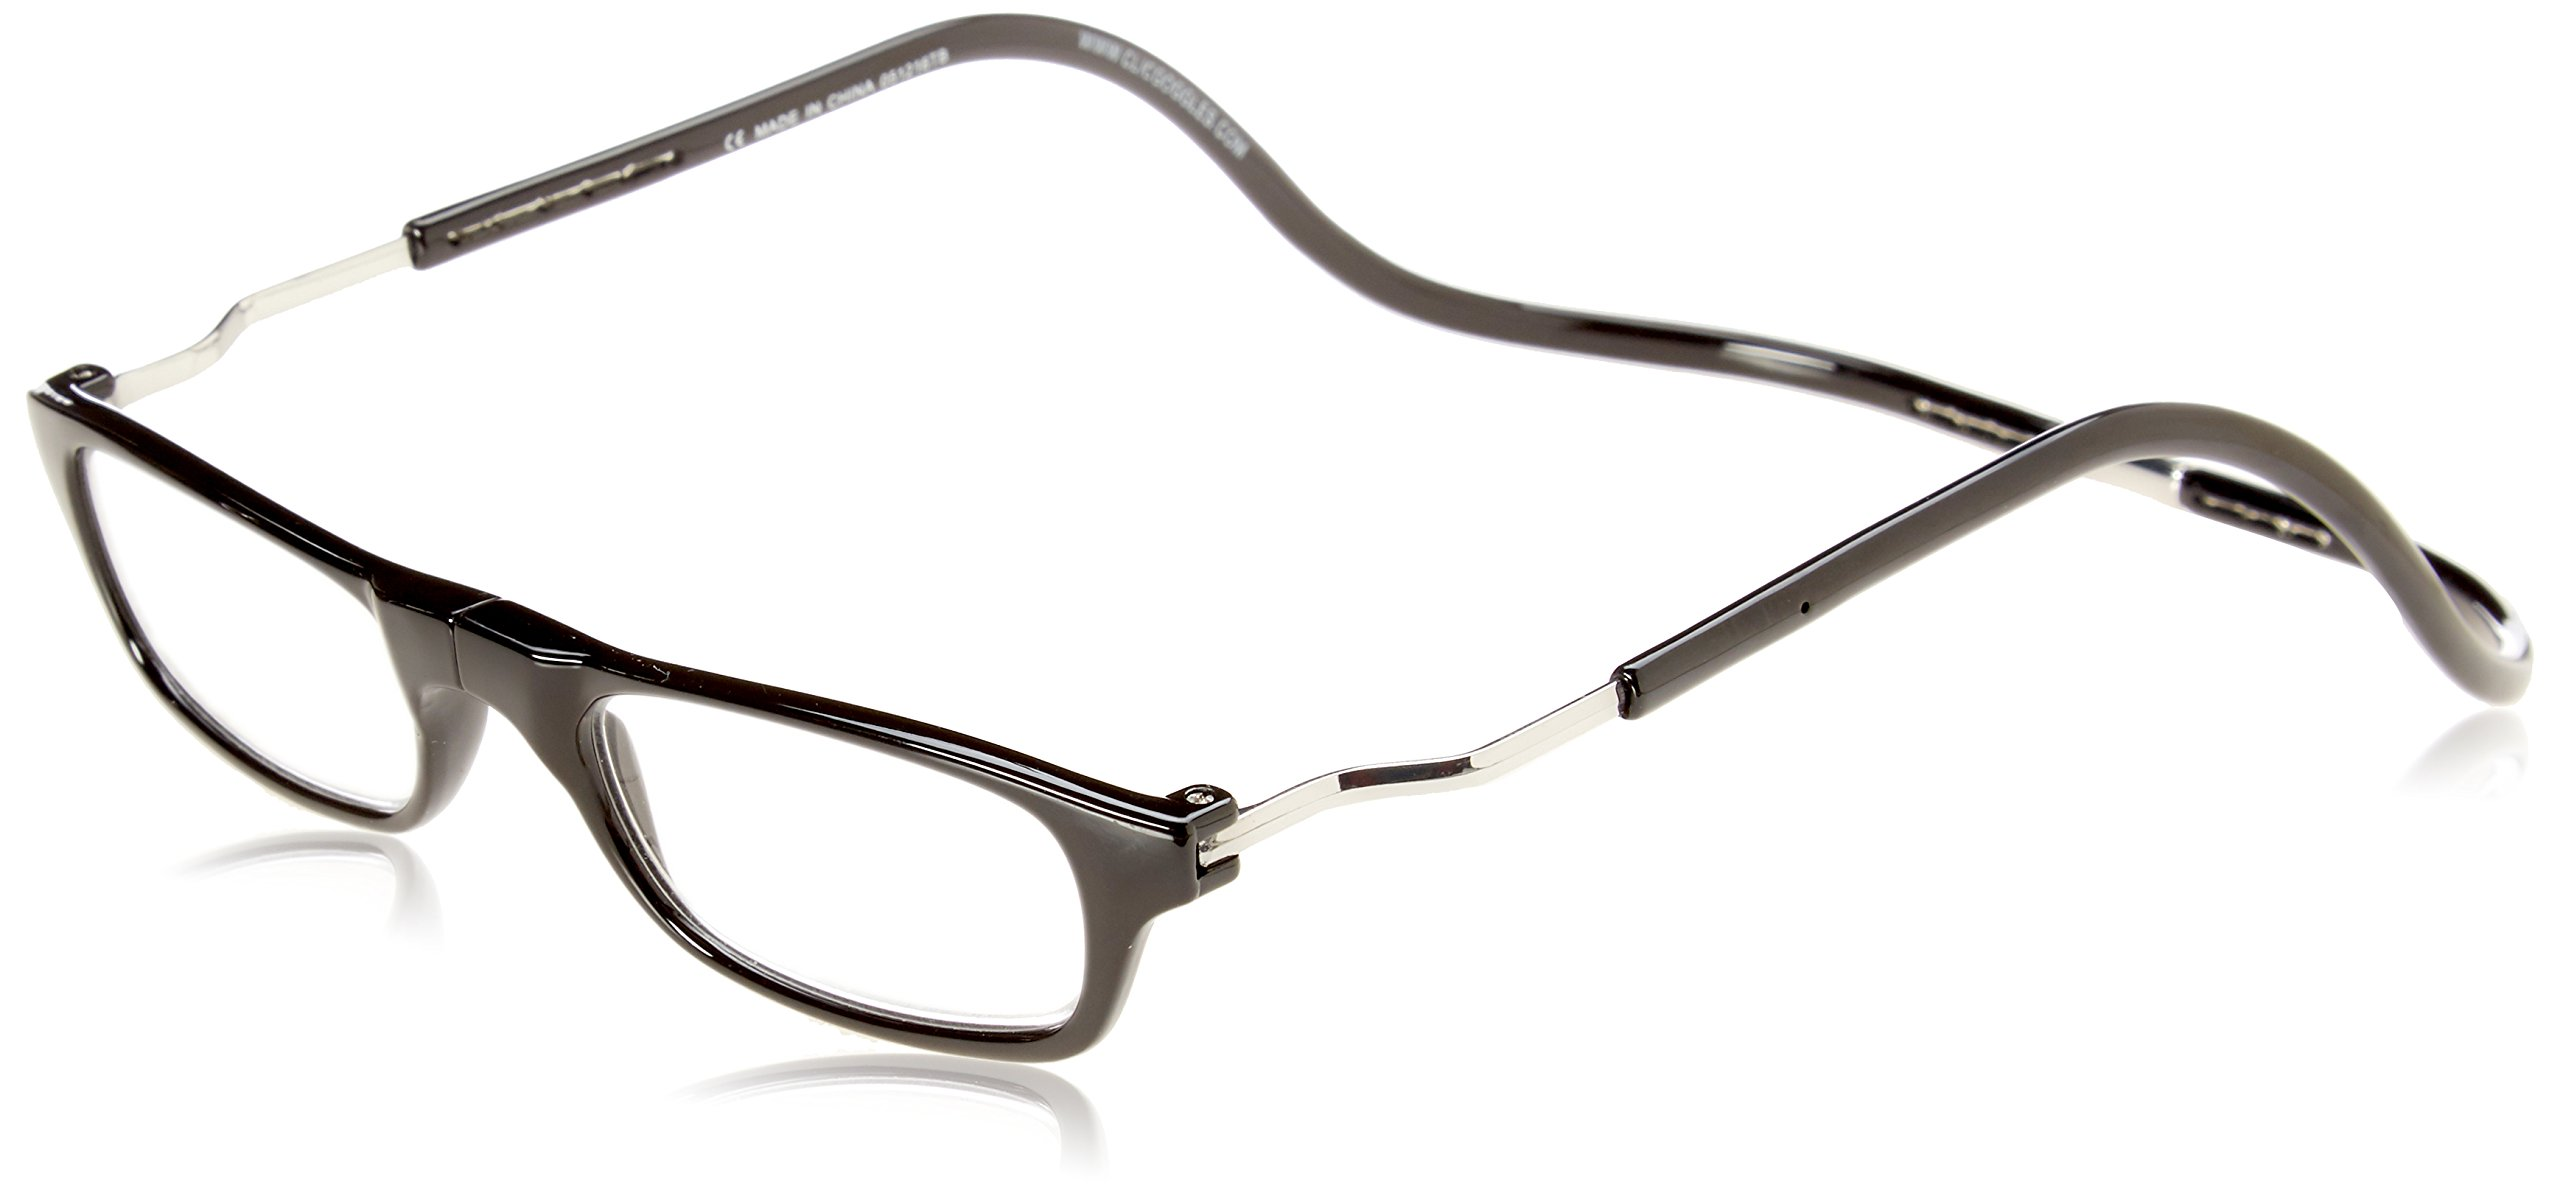 3754372cf8 Amazon.com  CliC Magnetic Closure Reading Glasses XXL with Adjustable  Headband Black 1.50  Health   Personal Care